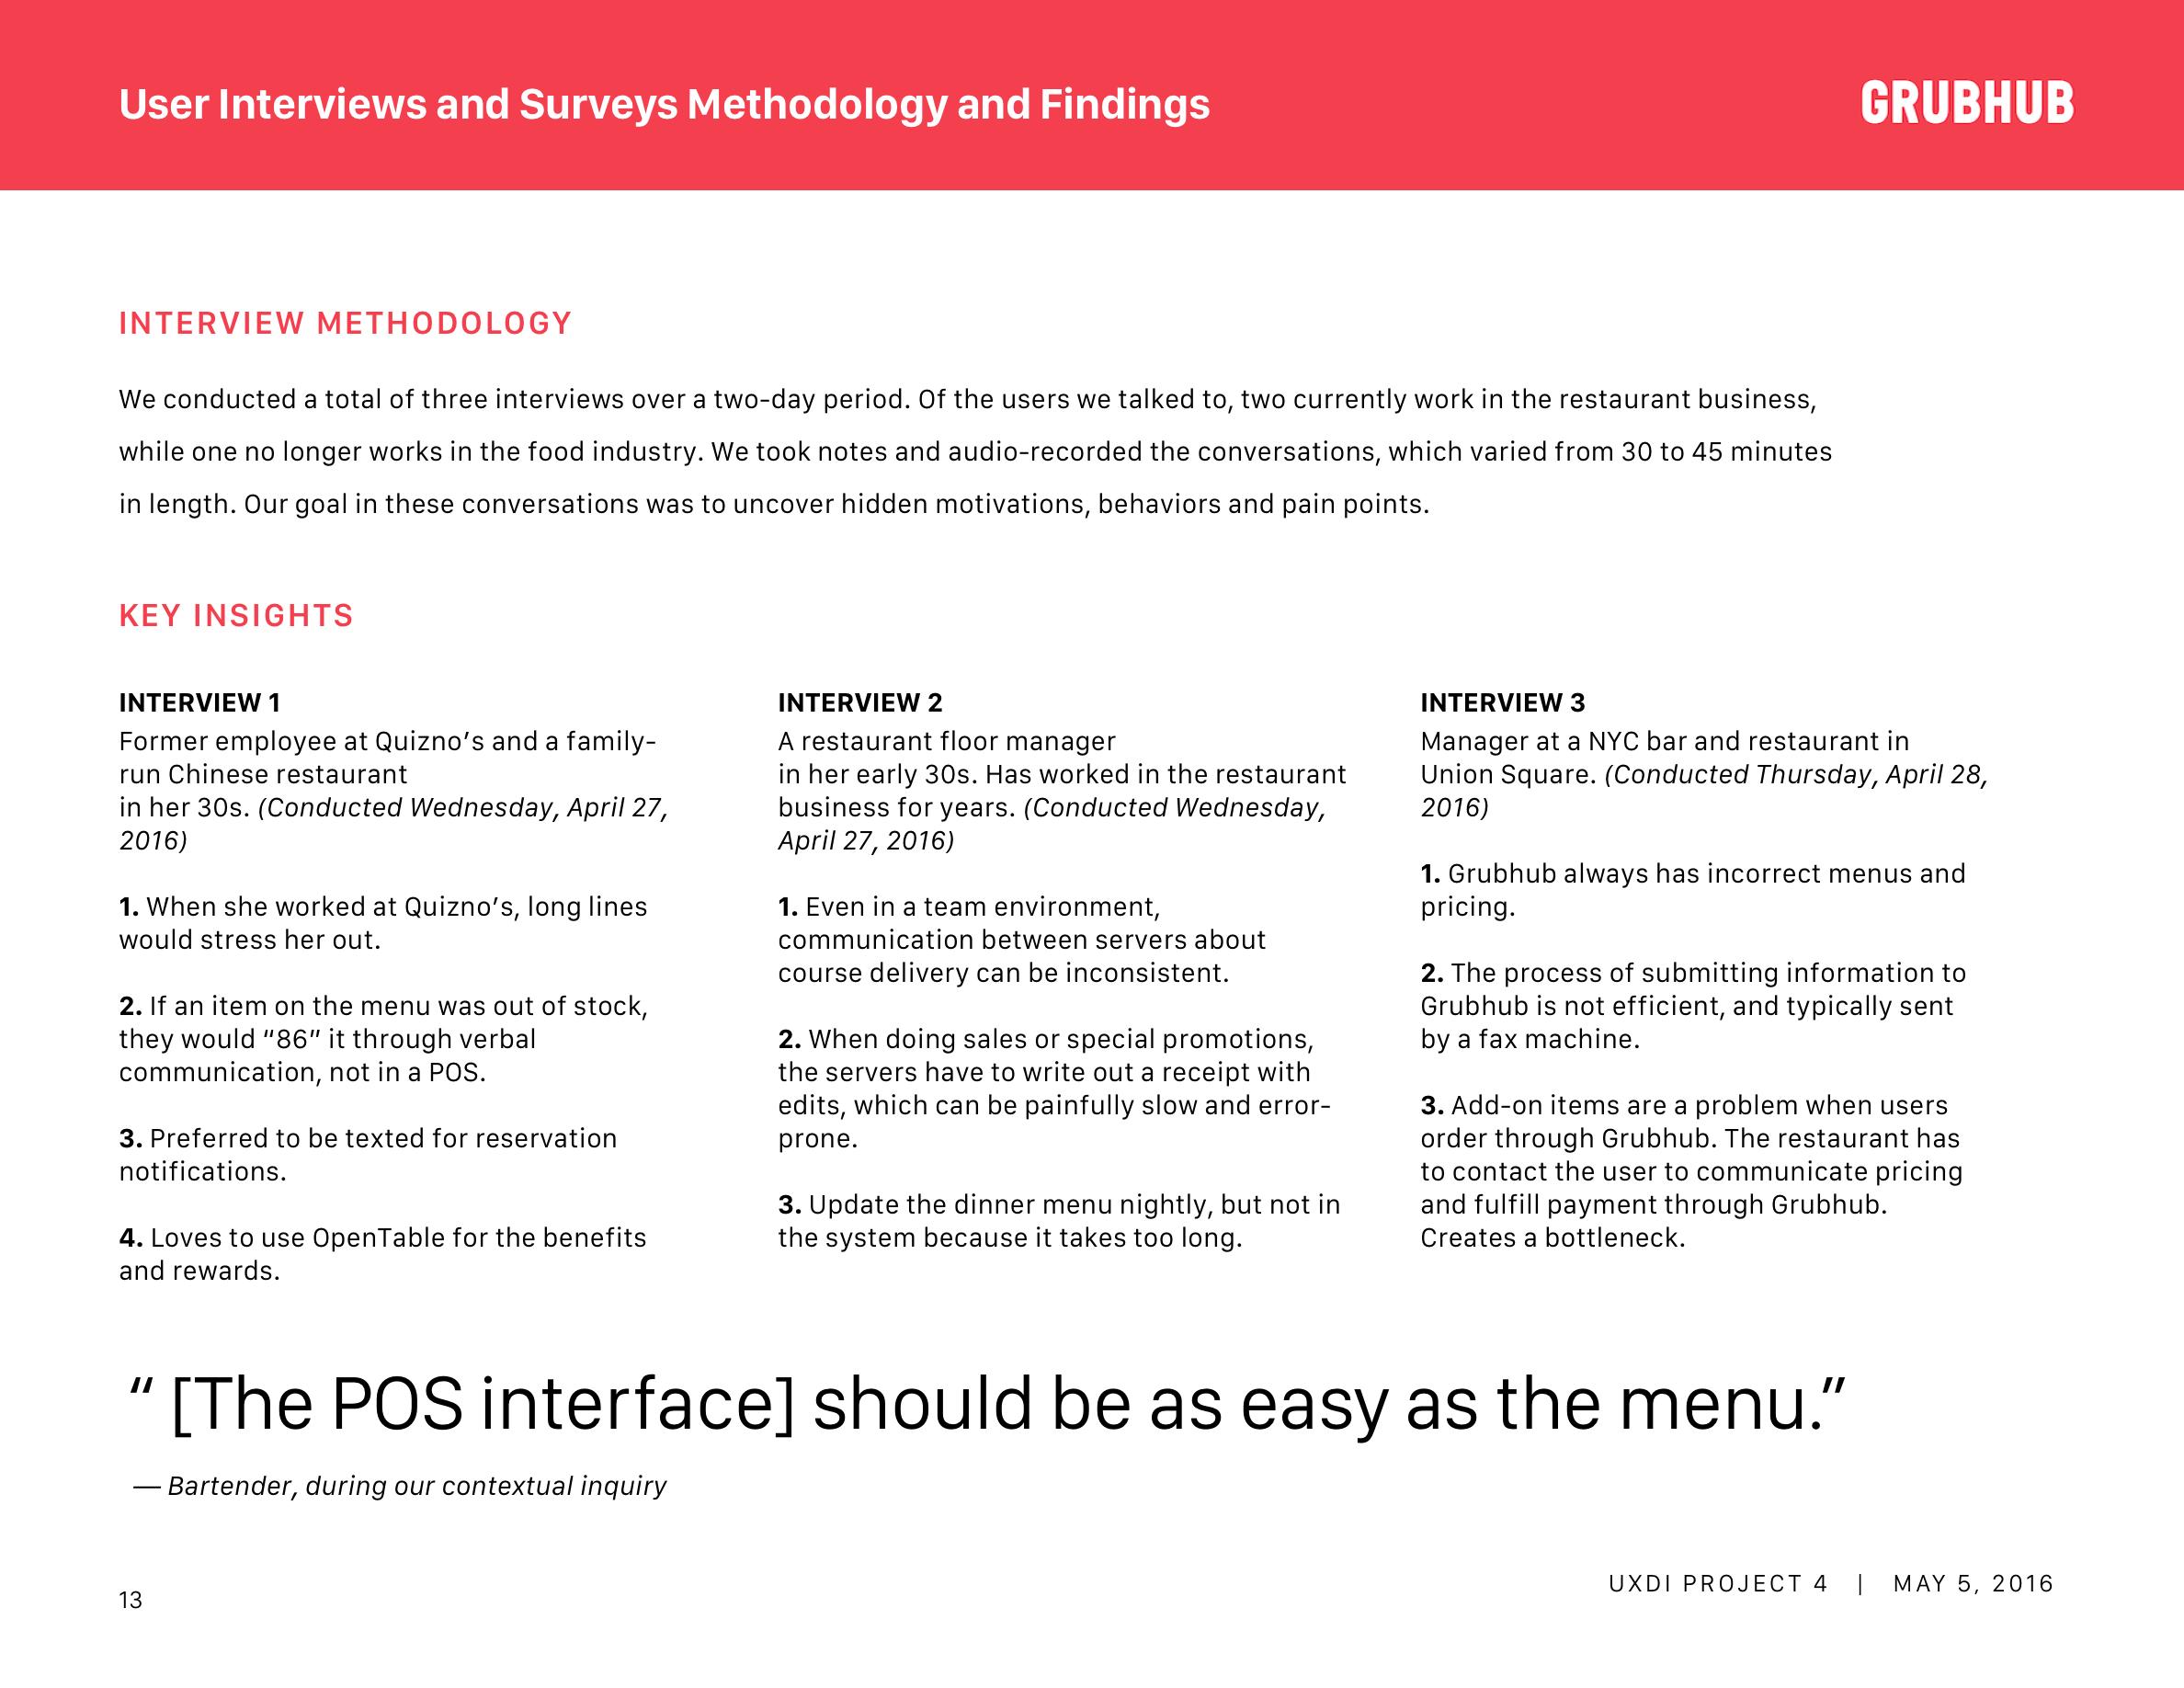 User Interviews and Surveys Methodology PAGE 3.jpg